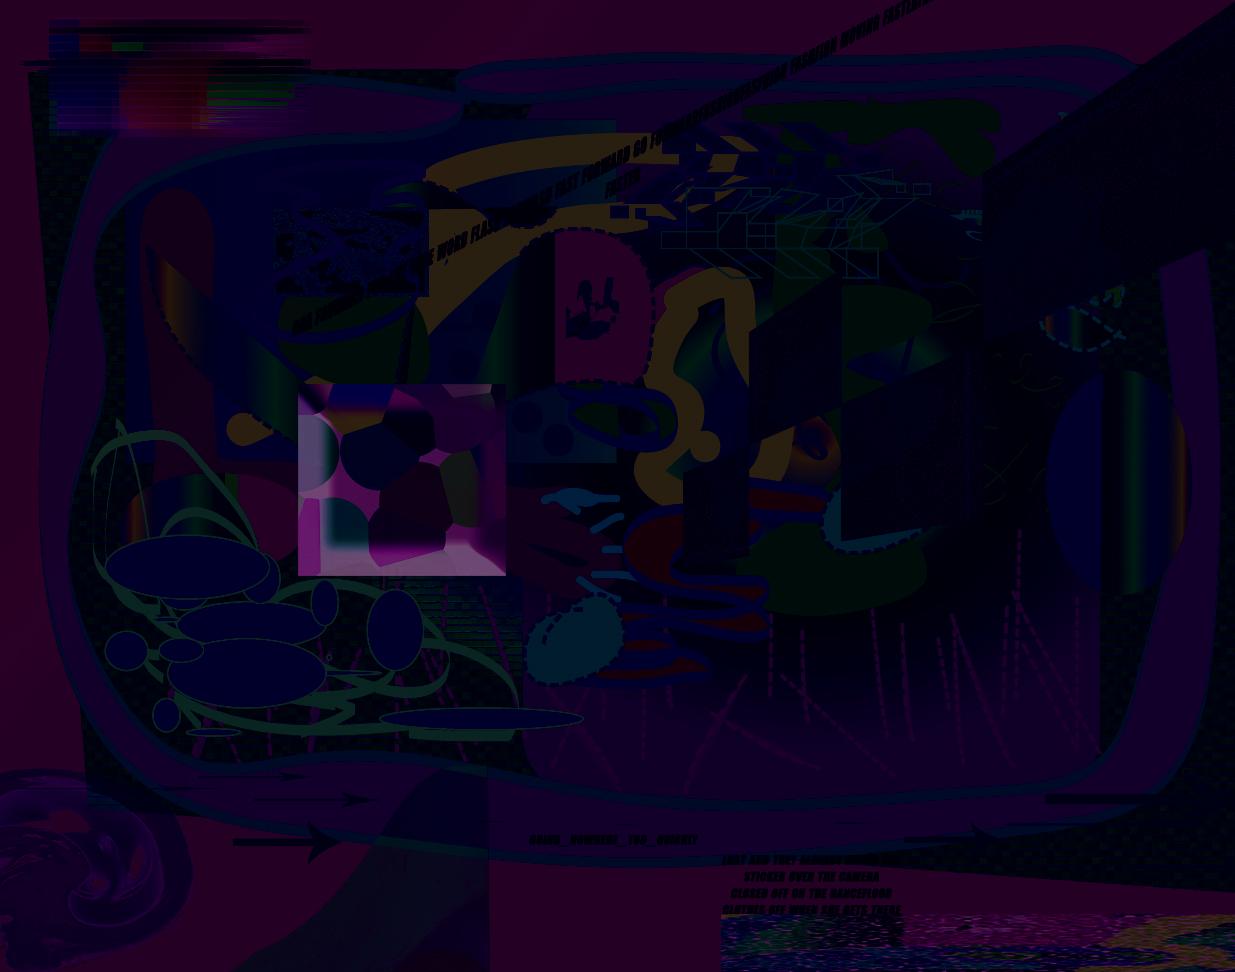 dh-0d1 copjy copy.jpg